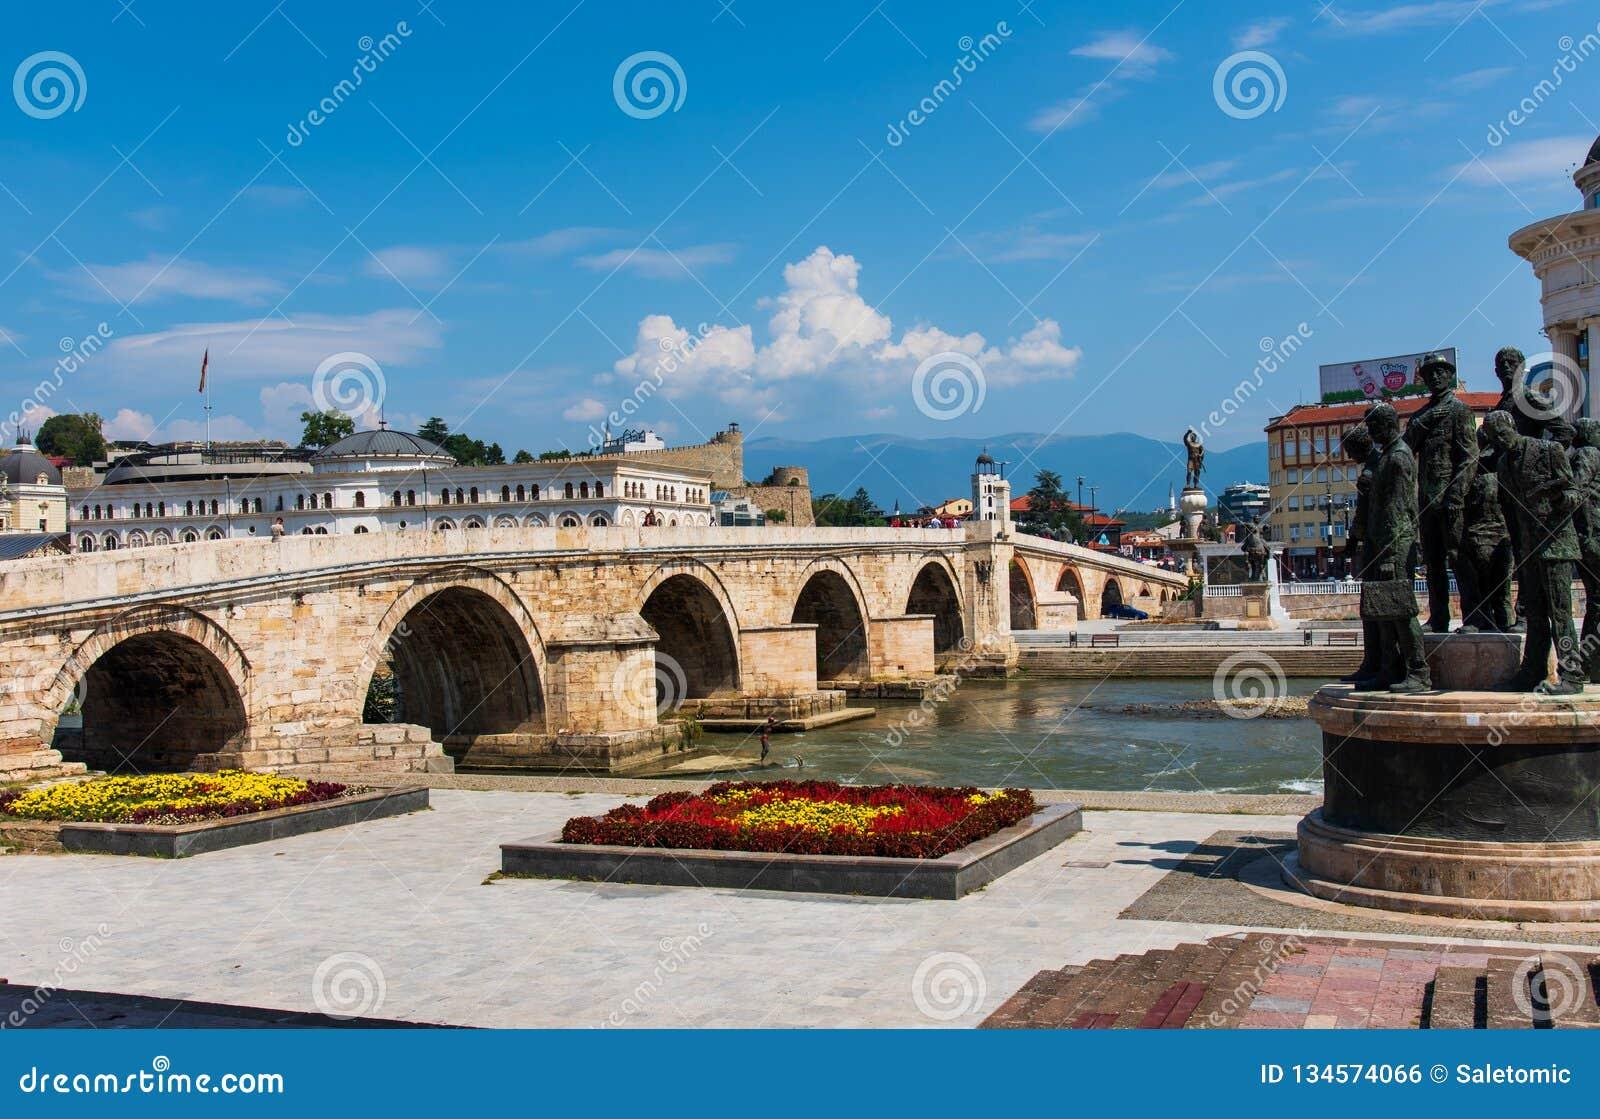 Skopje, Mazedonien - 26. August 2017: Skopje-Steinbrücke über Vardar-Fluss nahe Hauptplatz in Skopje